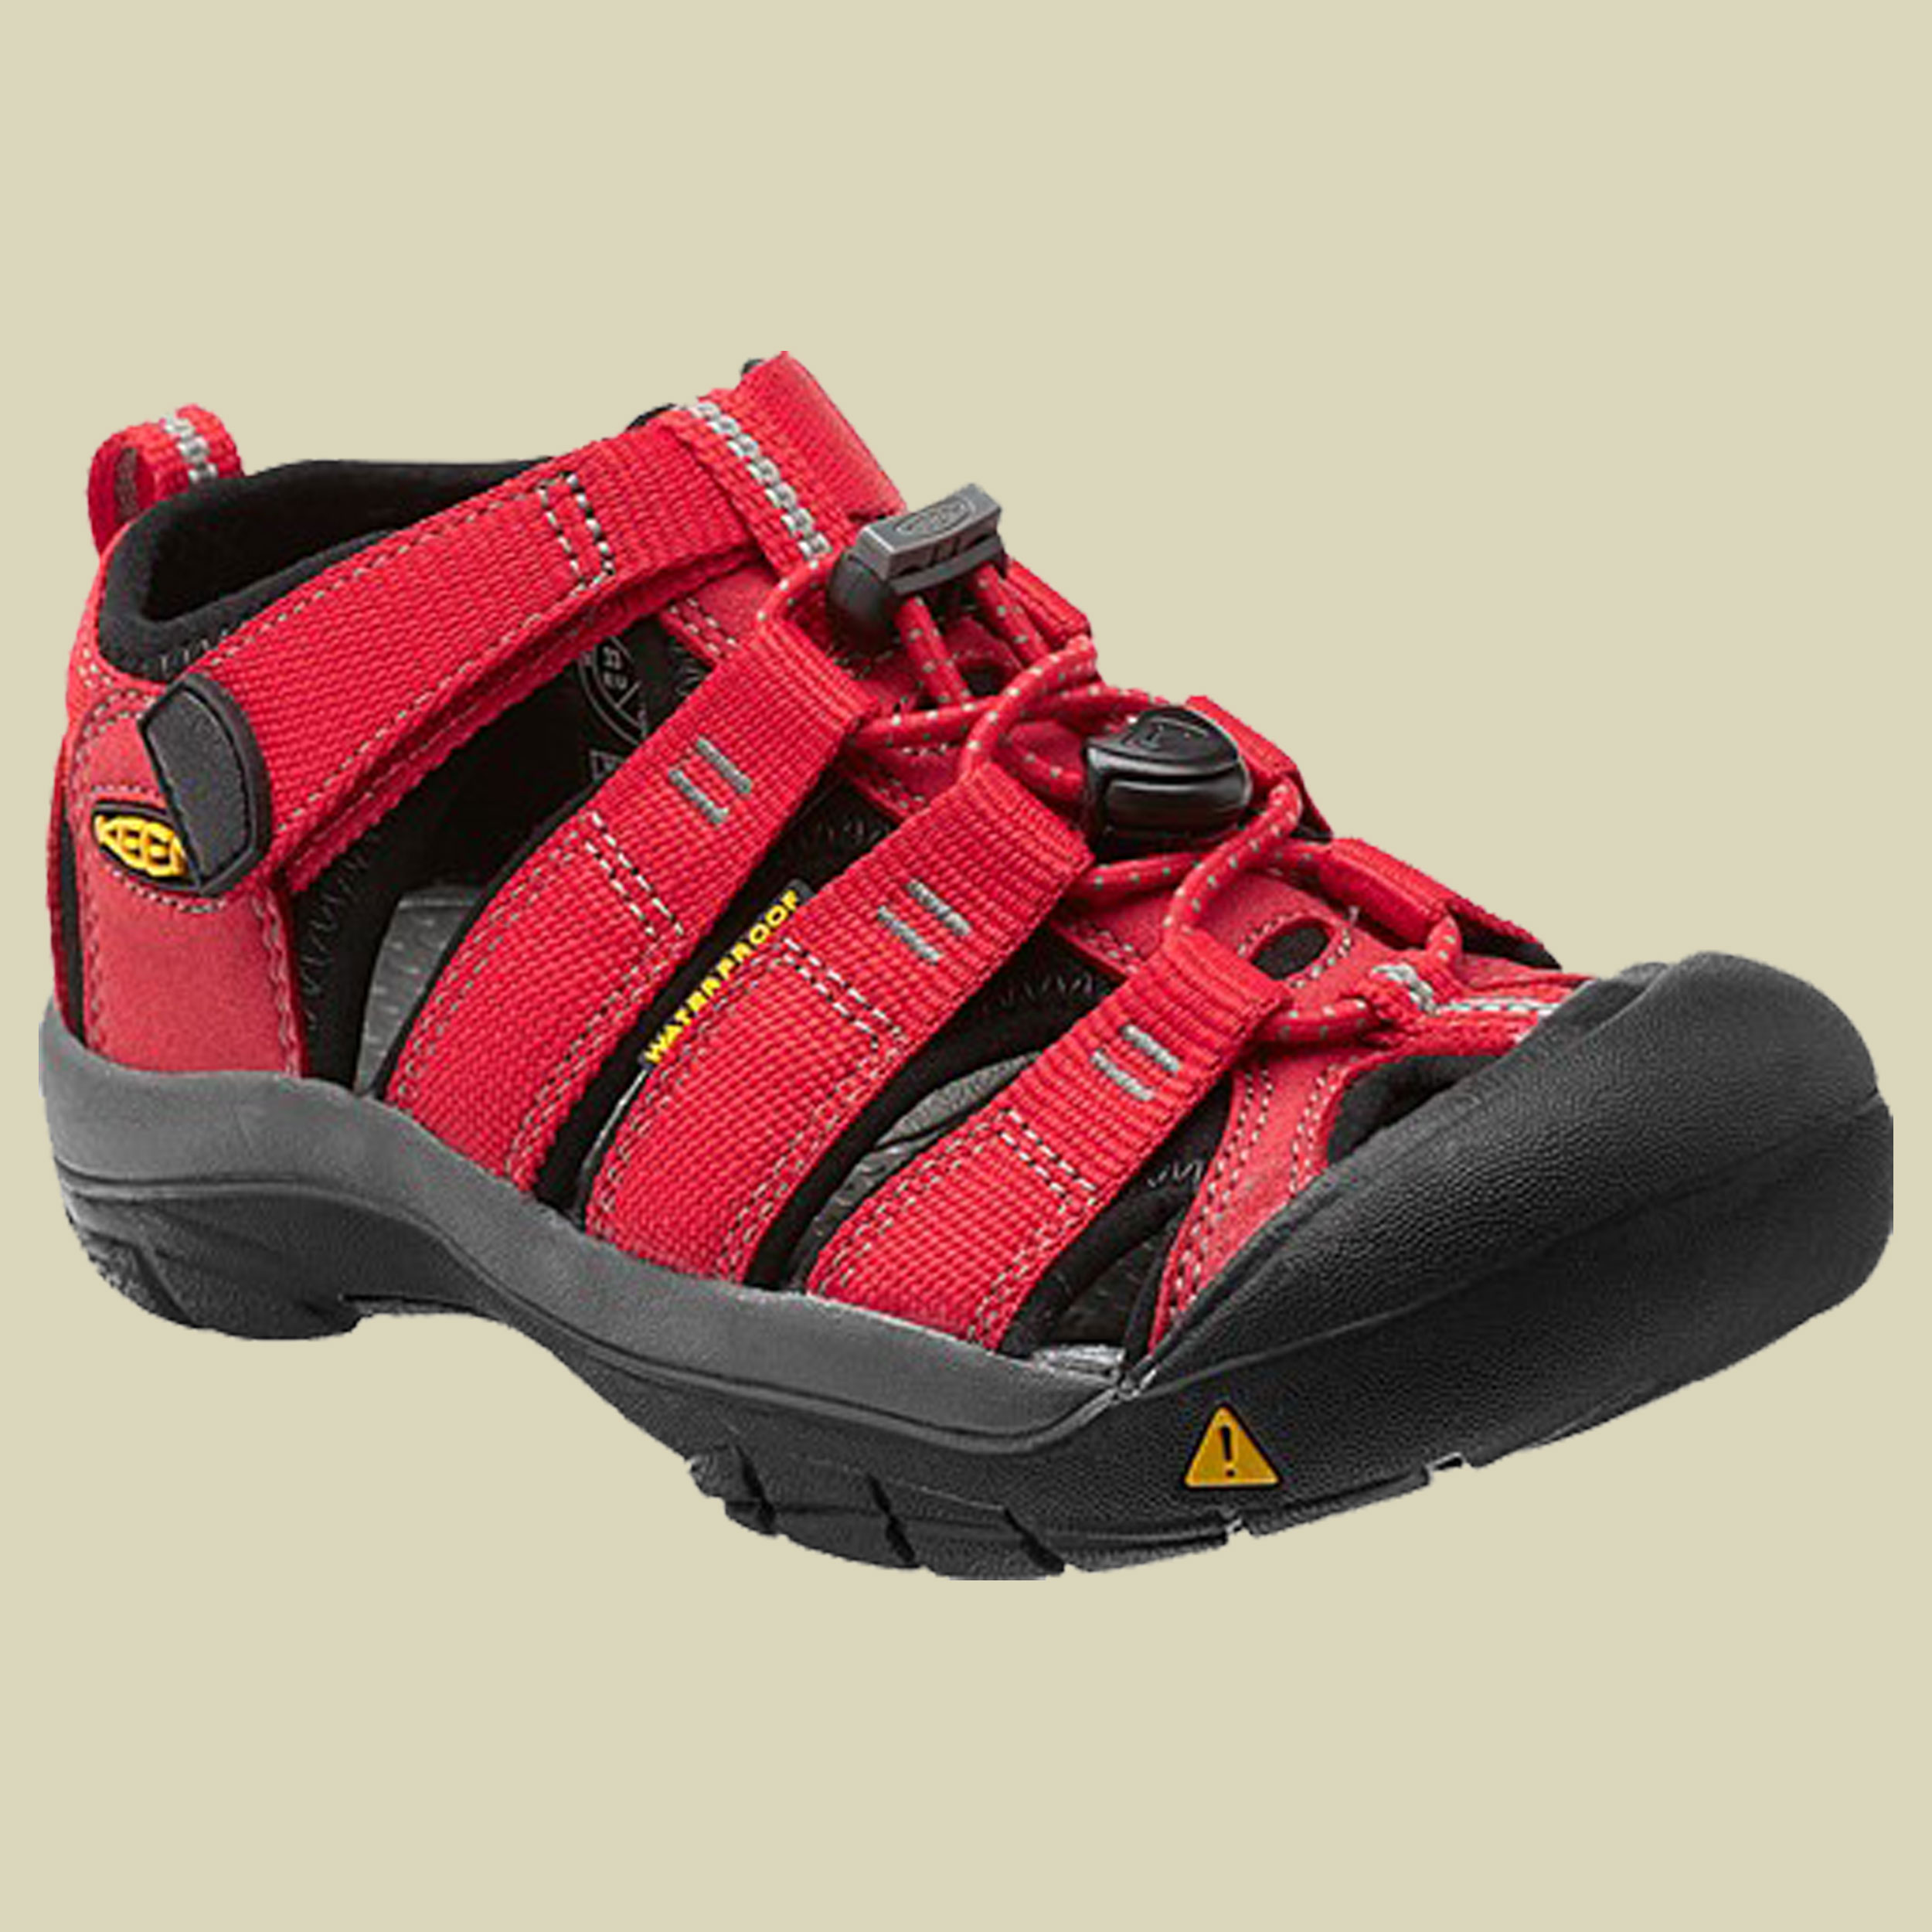 Keen Newport H2 Kids Trekking Sandale Kinder Größe 27-28 ribbon red-gargoyle